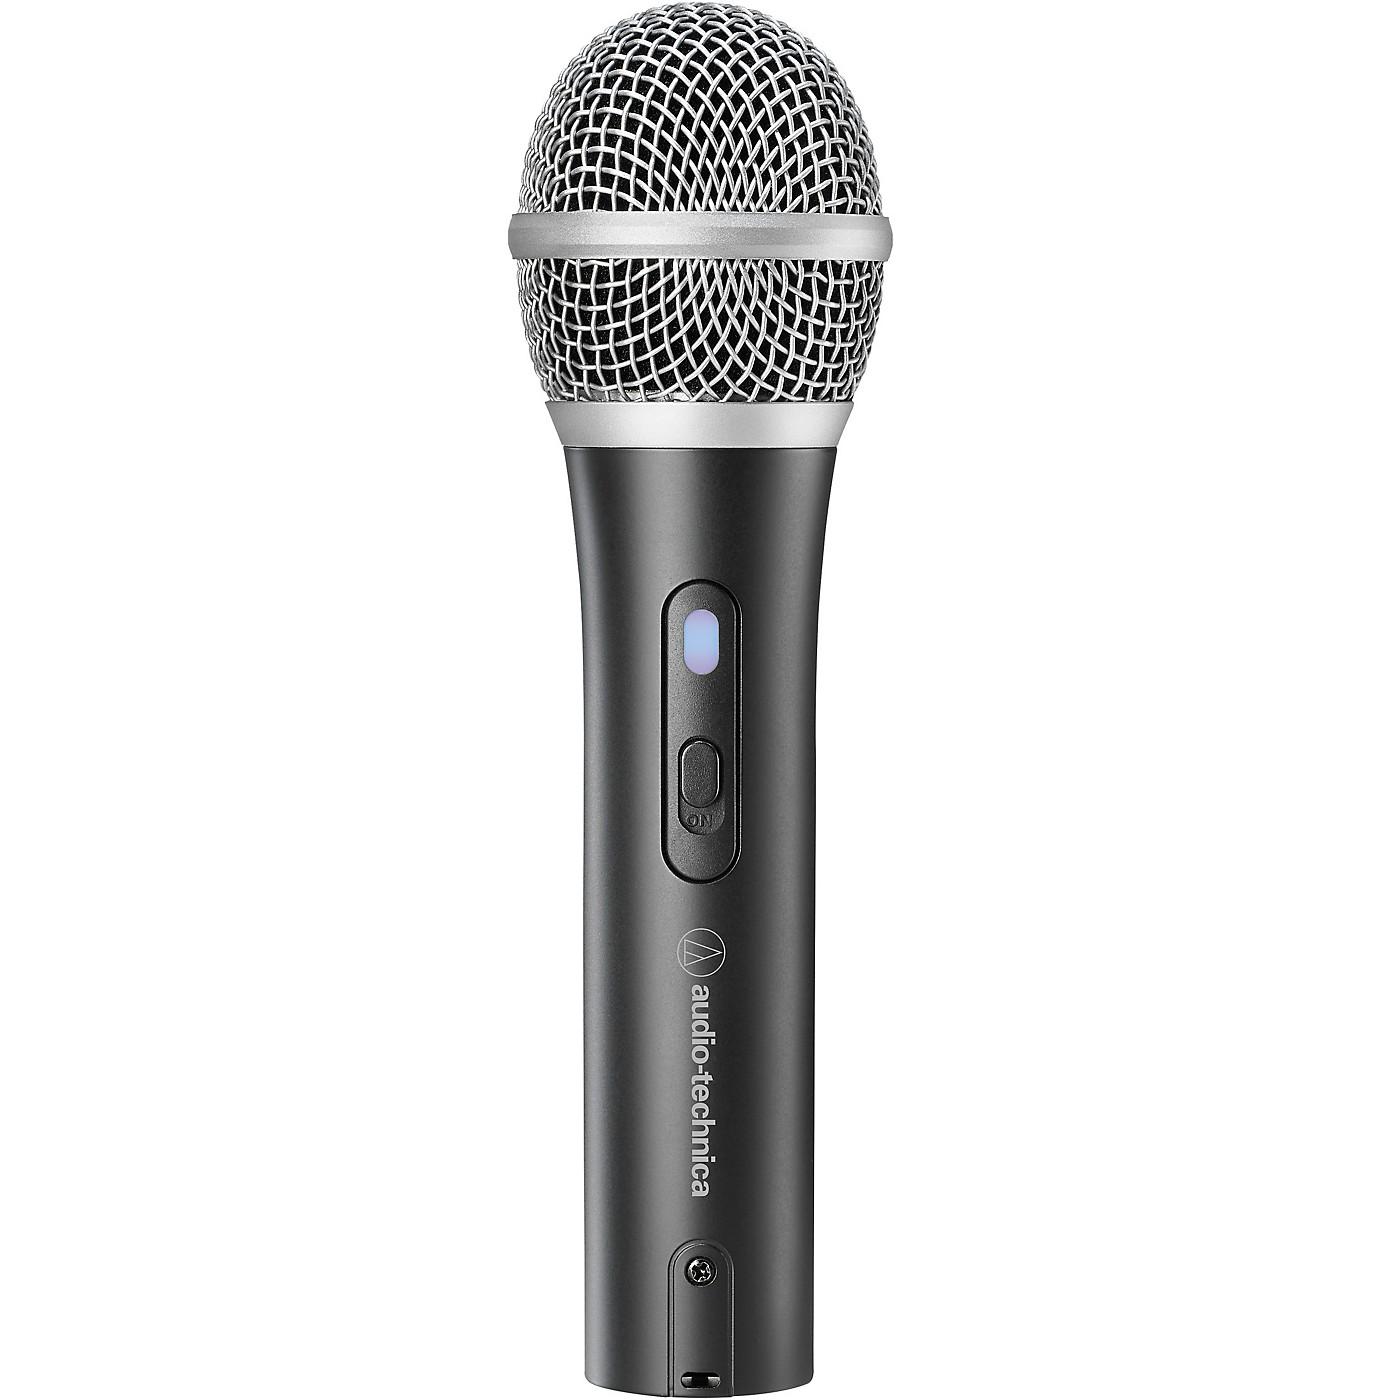 Audio-Technica ATR2100X-USB Cardioid Dynamic USB/XLR Microphone thumbnail